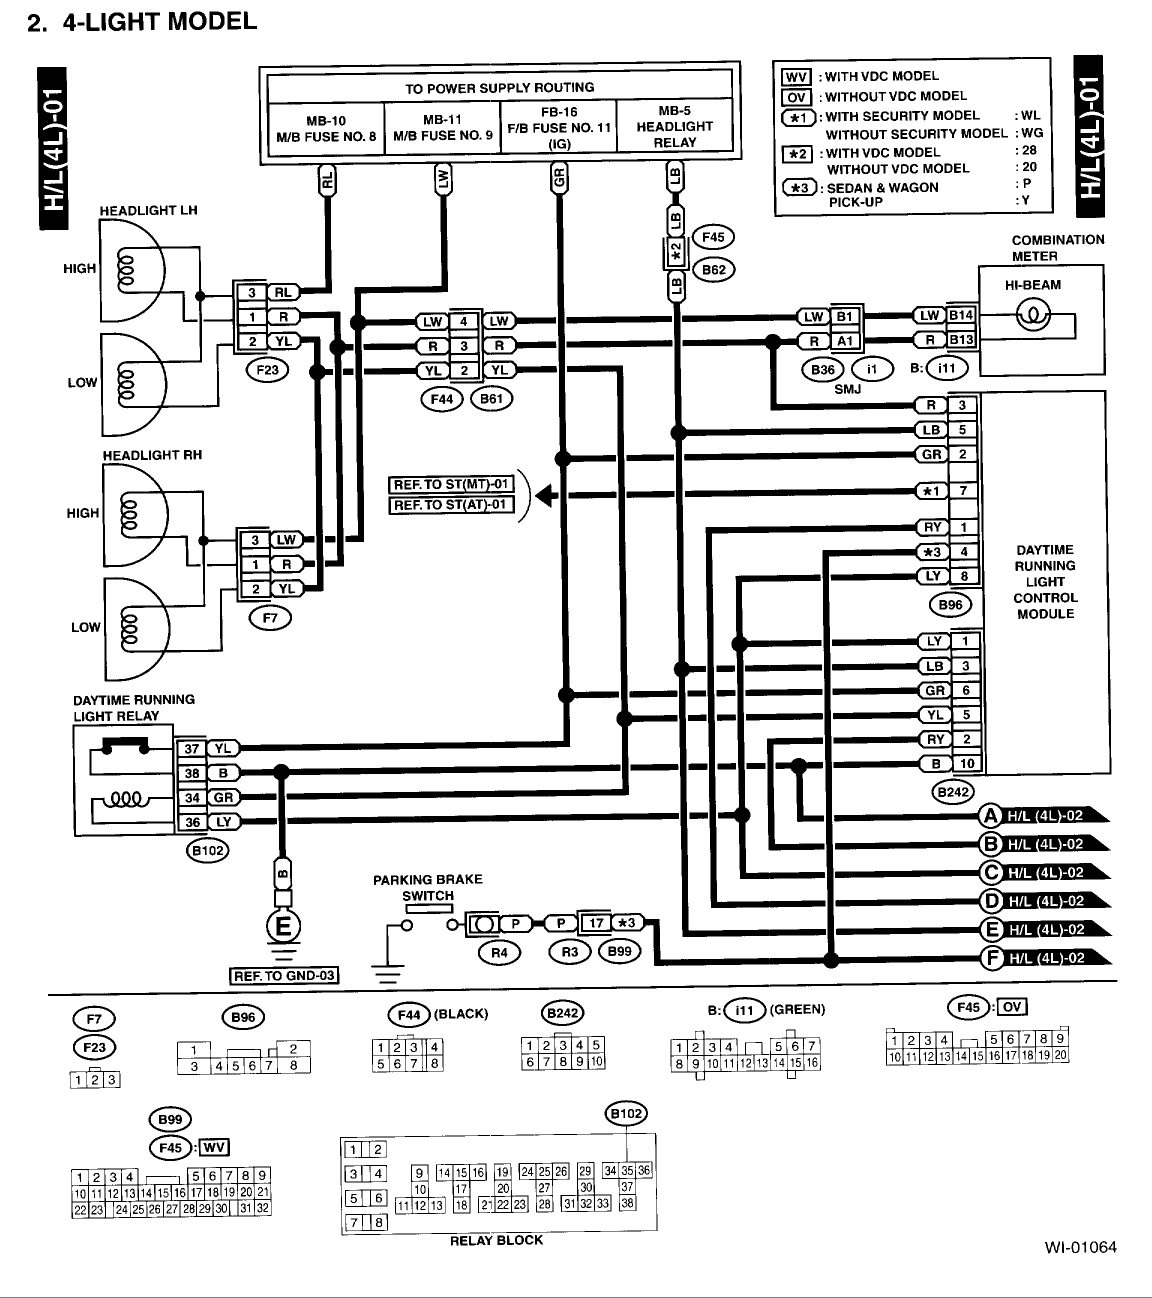 subaru impreza stereo wiring diagram wiring diagrams 2012 Subaru Impreza 2005 subaru outback wiring harness 5 rrw linda cosmetics de \\u20222005 subaru outback wiring harness